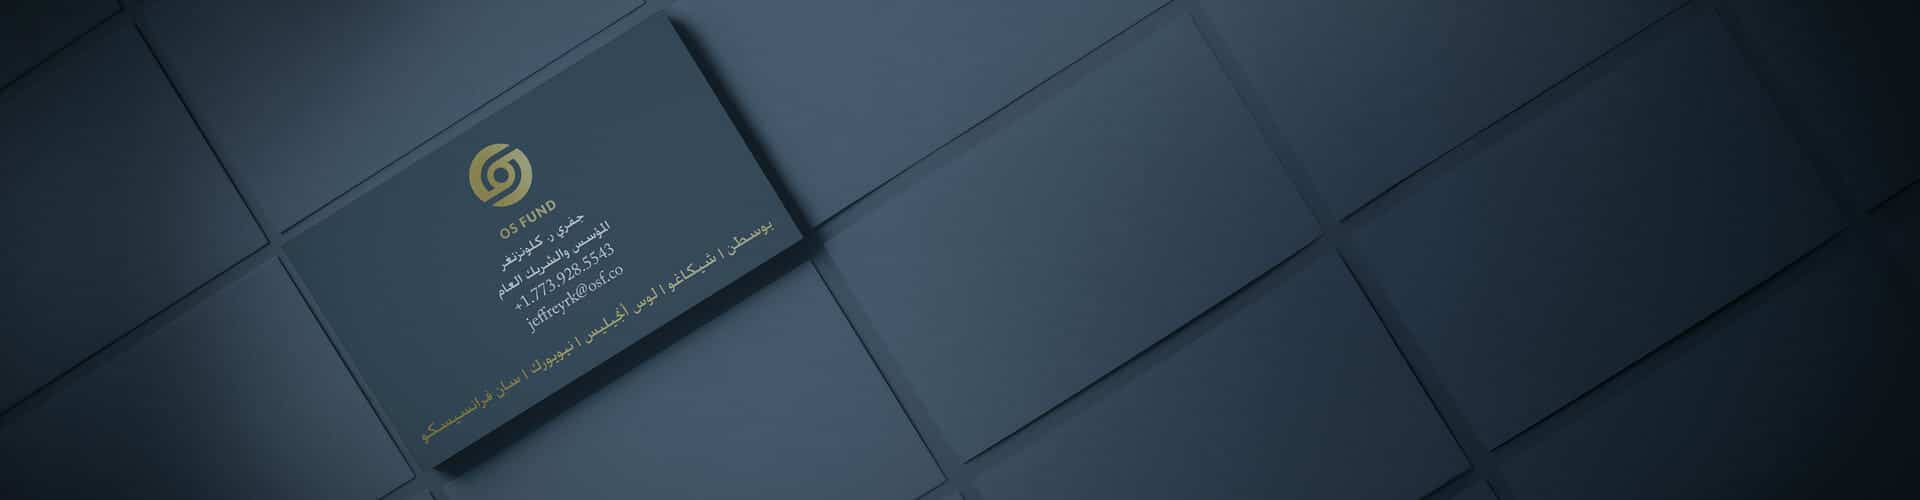 Bilingual Arabic Business Card Translation & Printing Banner 01